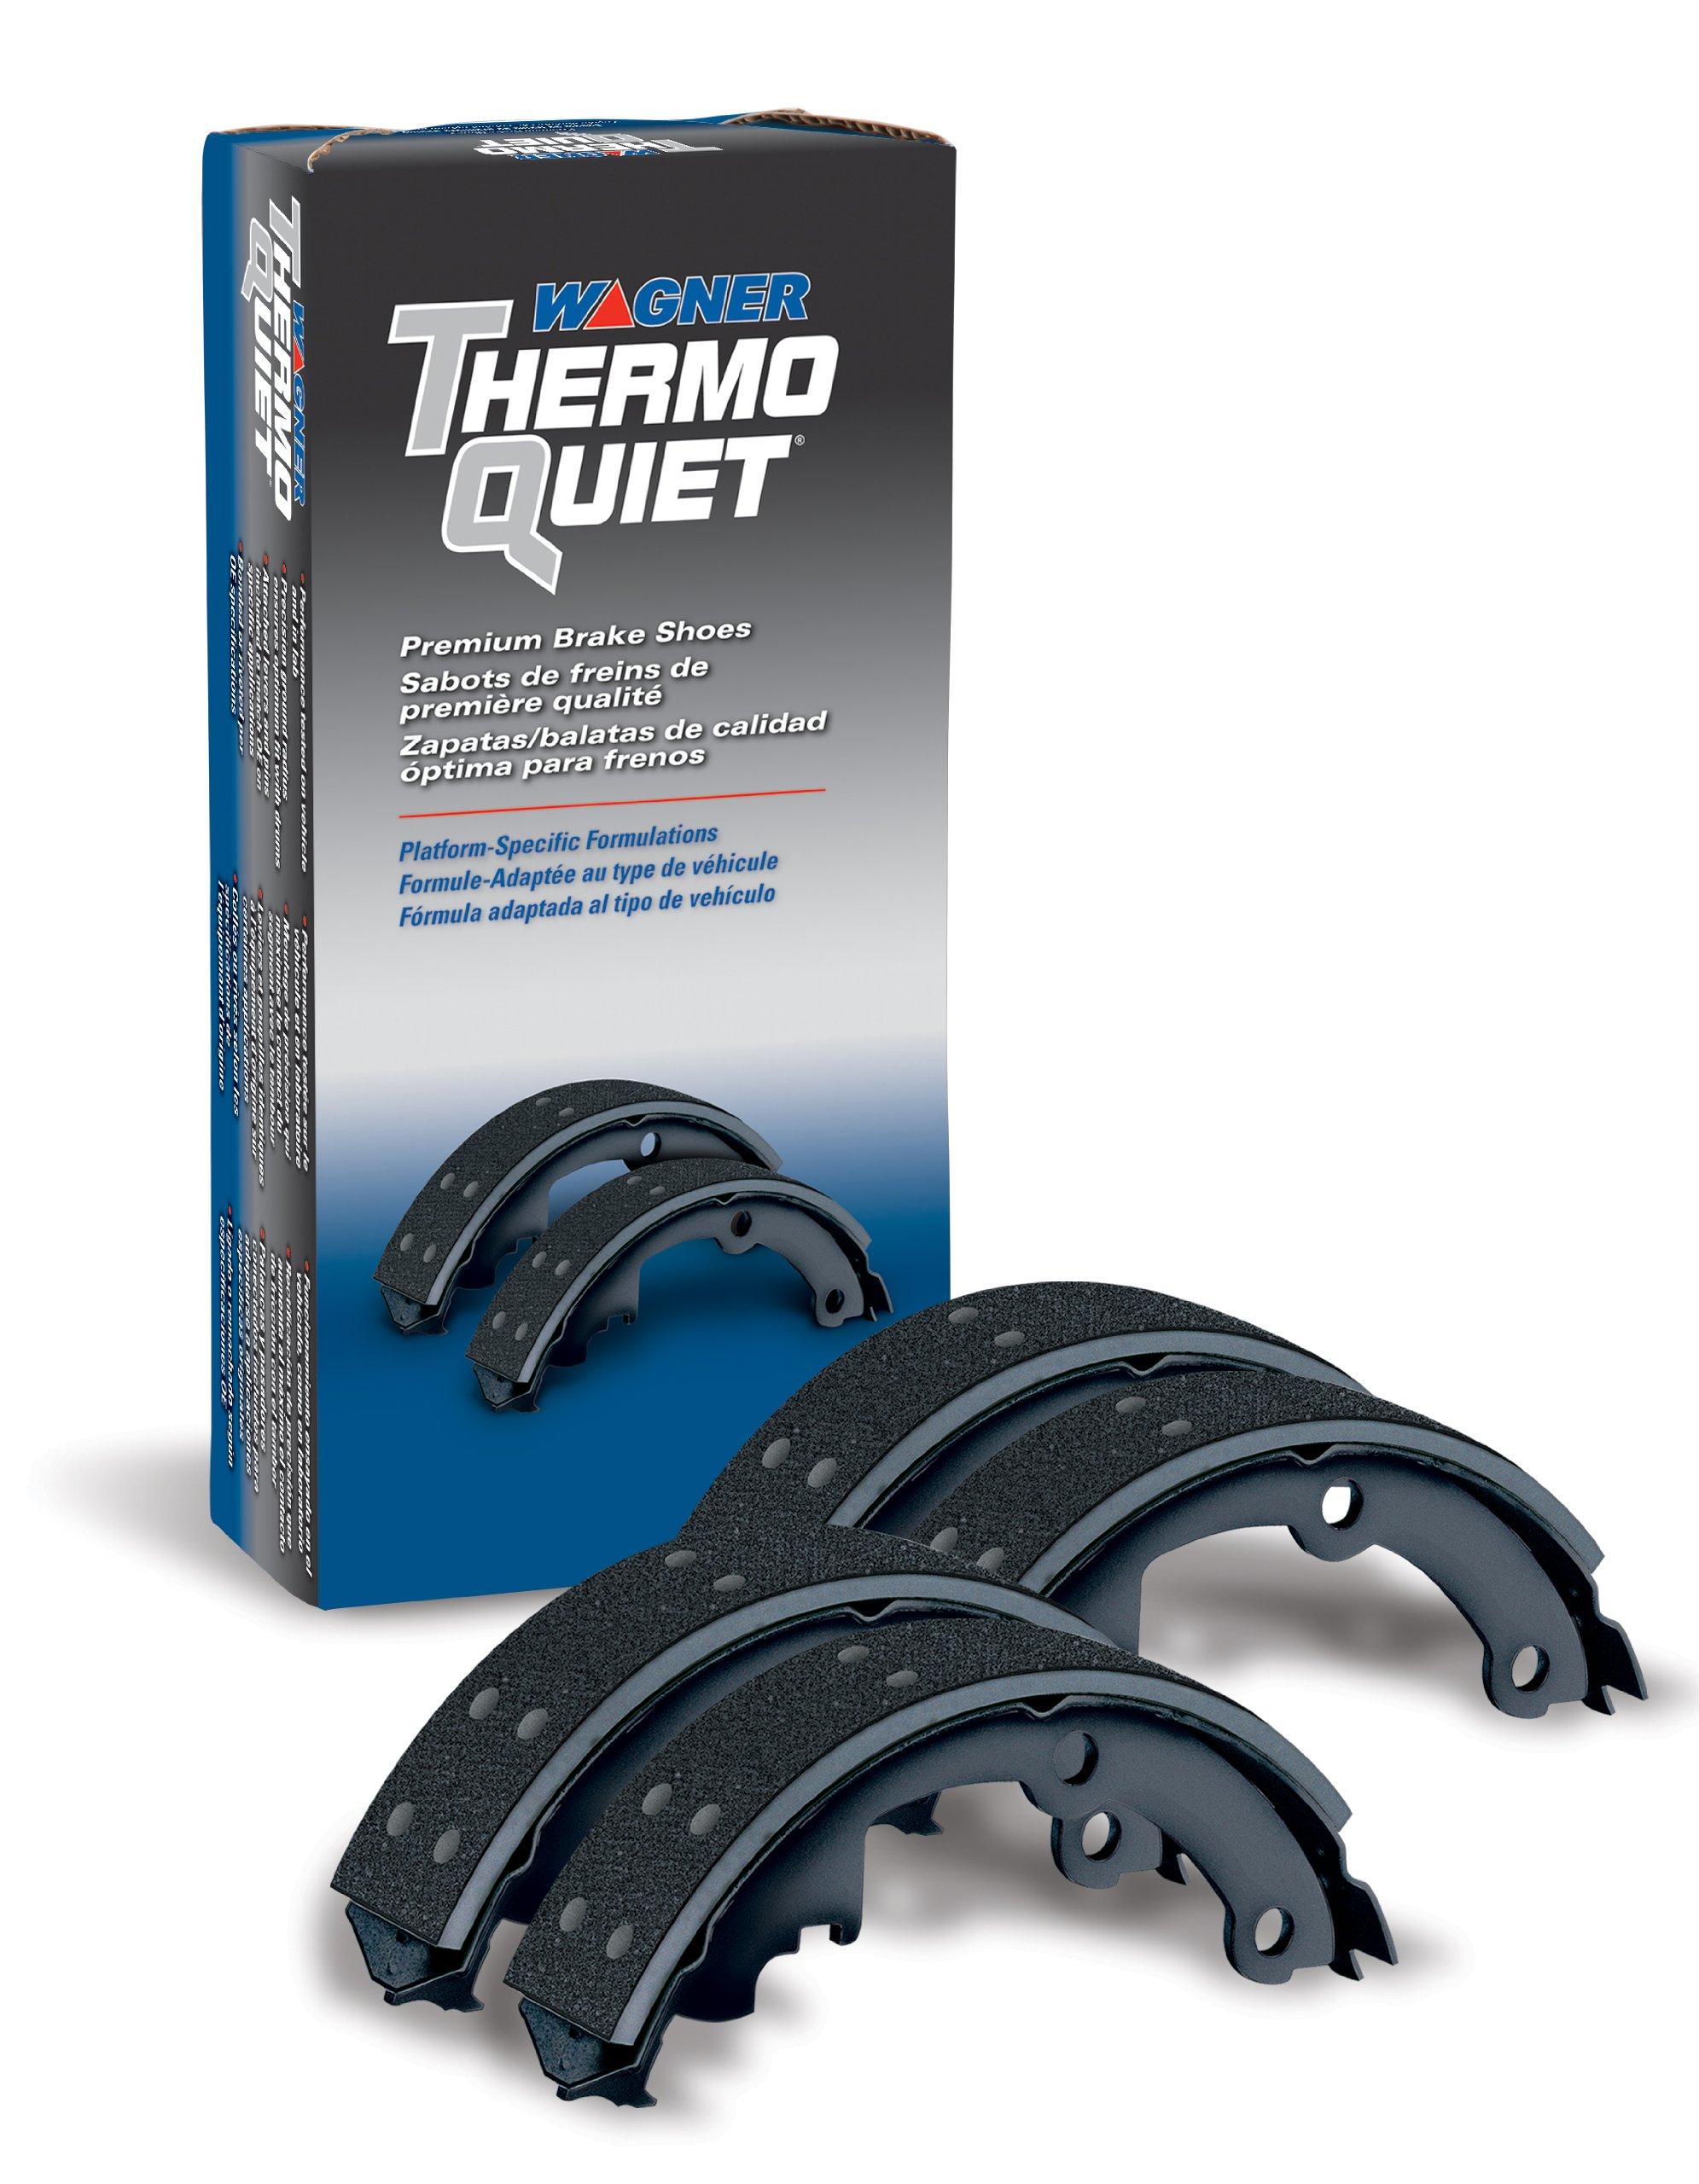 Wagner ThermoQuiet PAB627 Brake Shoe Set, Rear